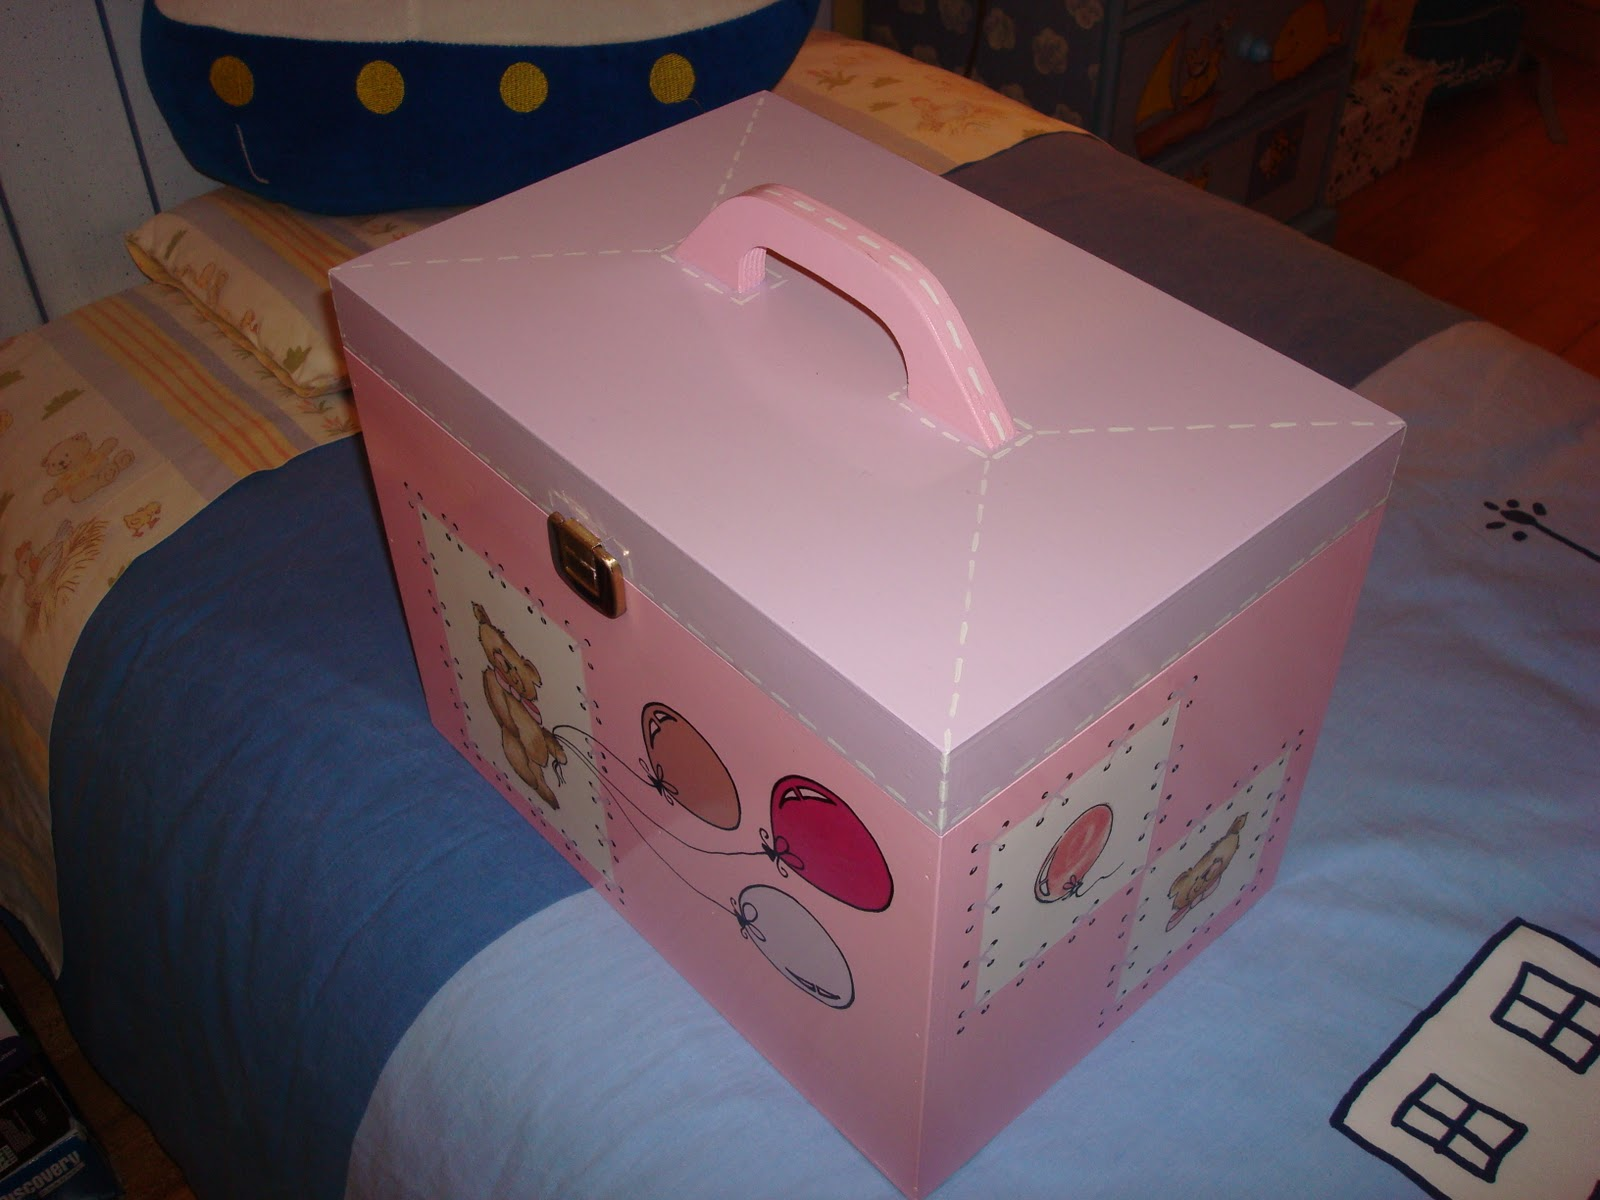 caixa de medicamentos ou necessaire caixa de madeira tintas acrilicas  #6C4035 1600x1200